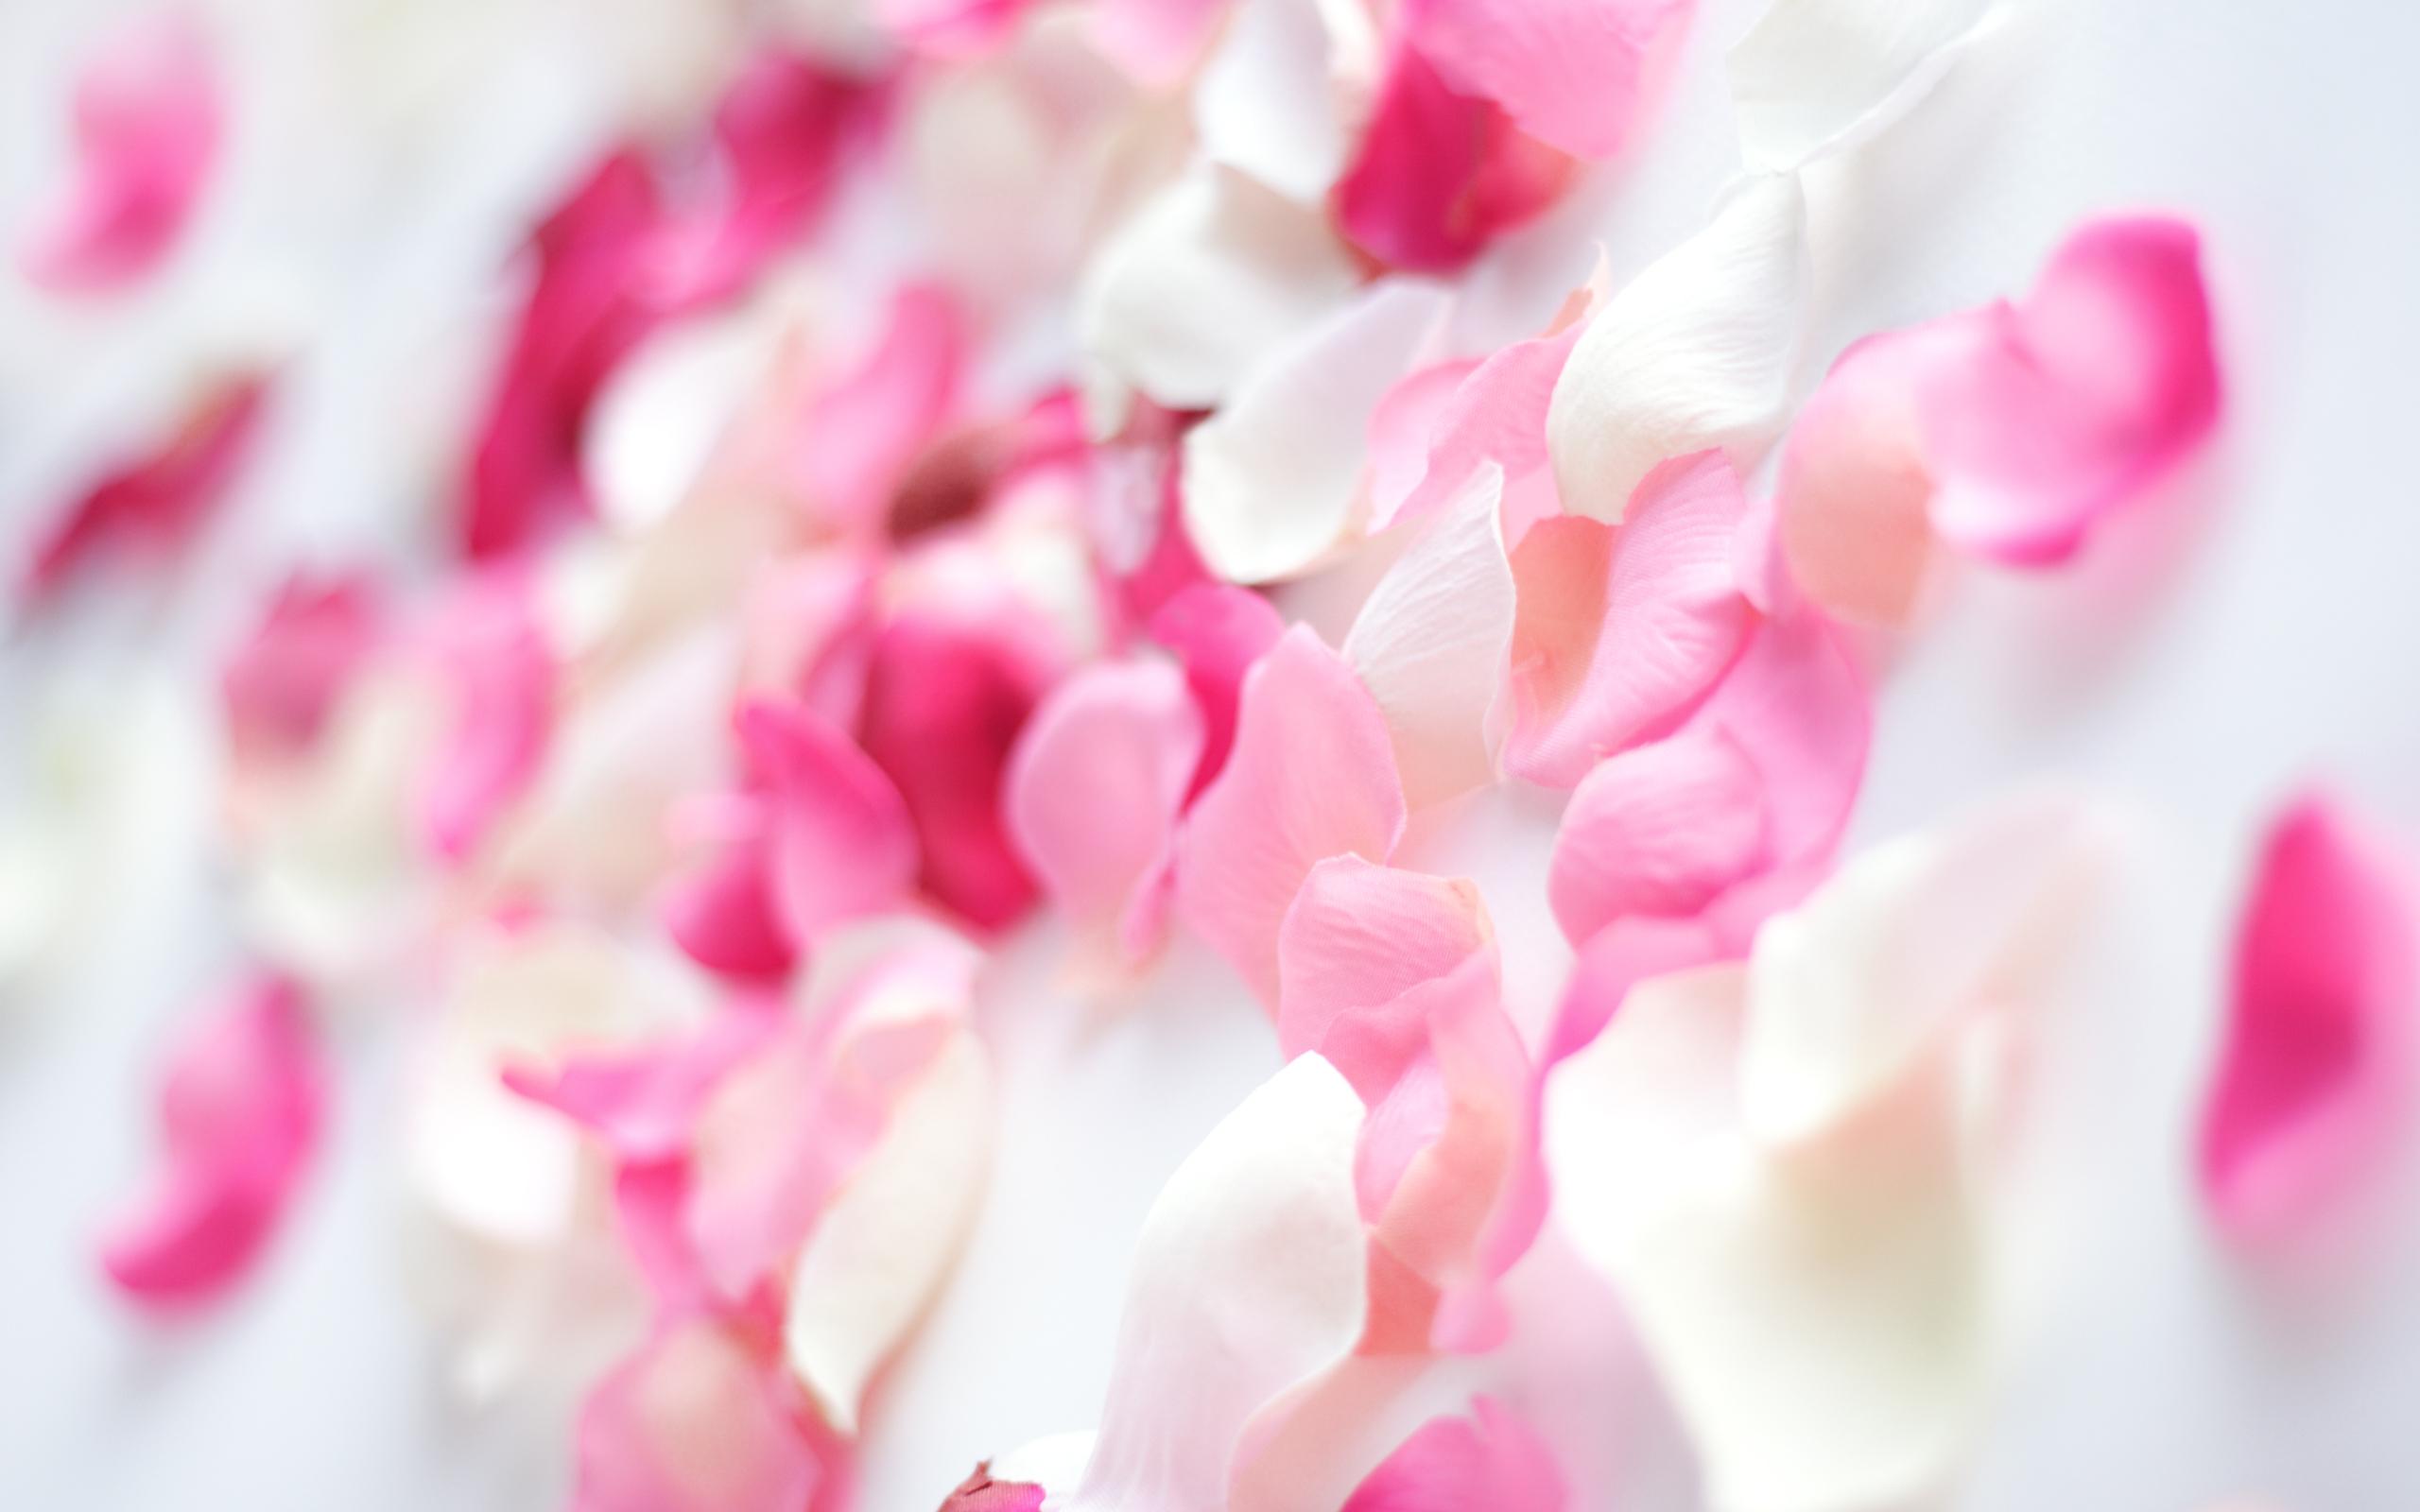 flower petal images 25891